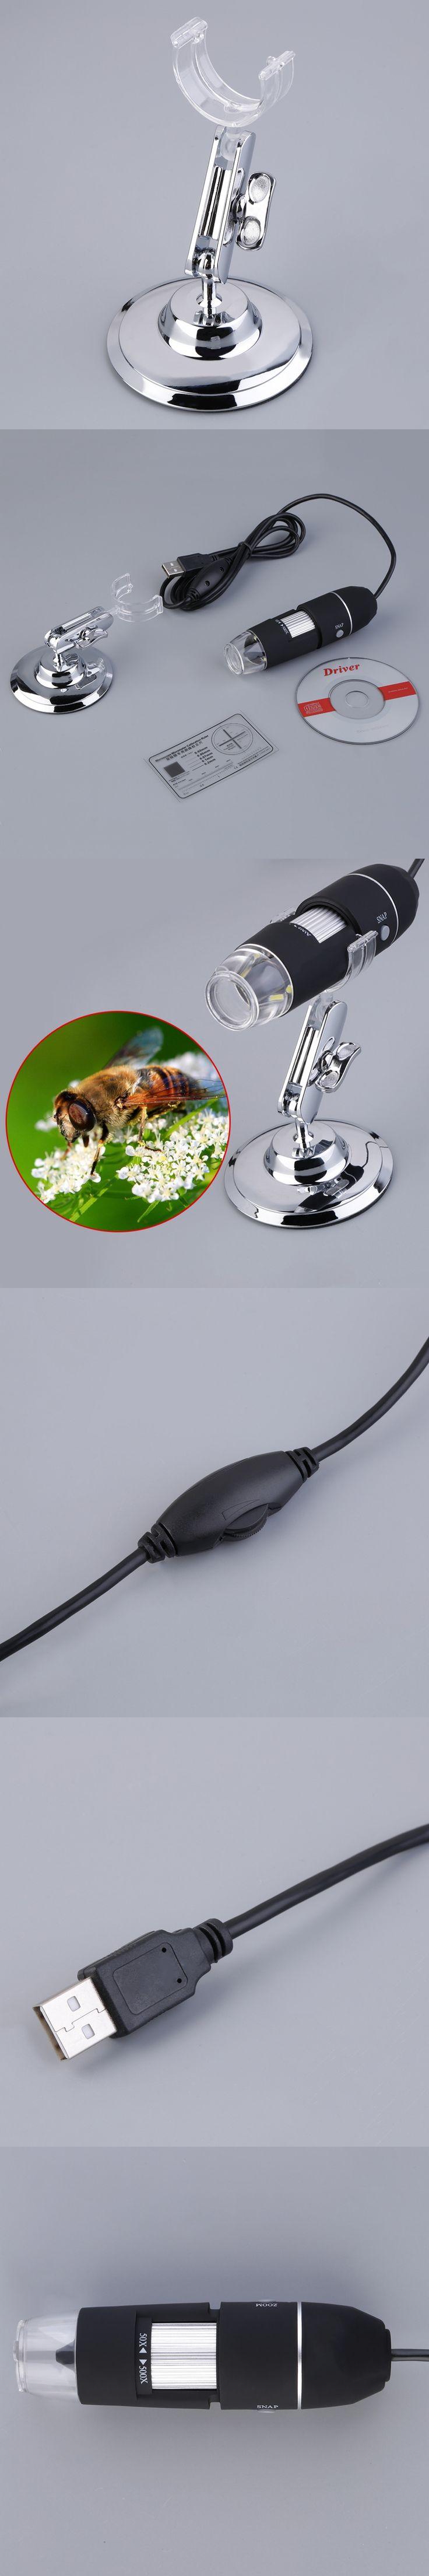 ACEHE Practical Electronics 5MP USB 8 LED Digital Camera Microscope Endoscope Magnifier Magnification Measure